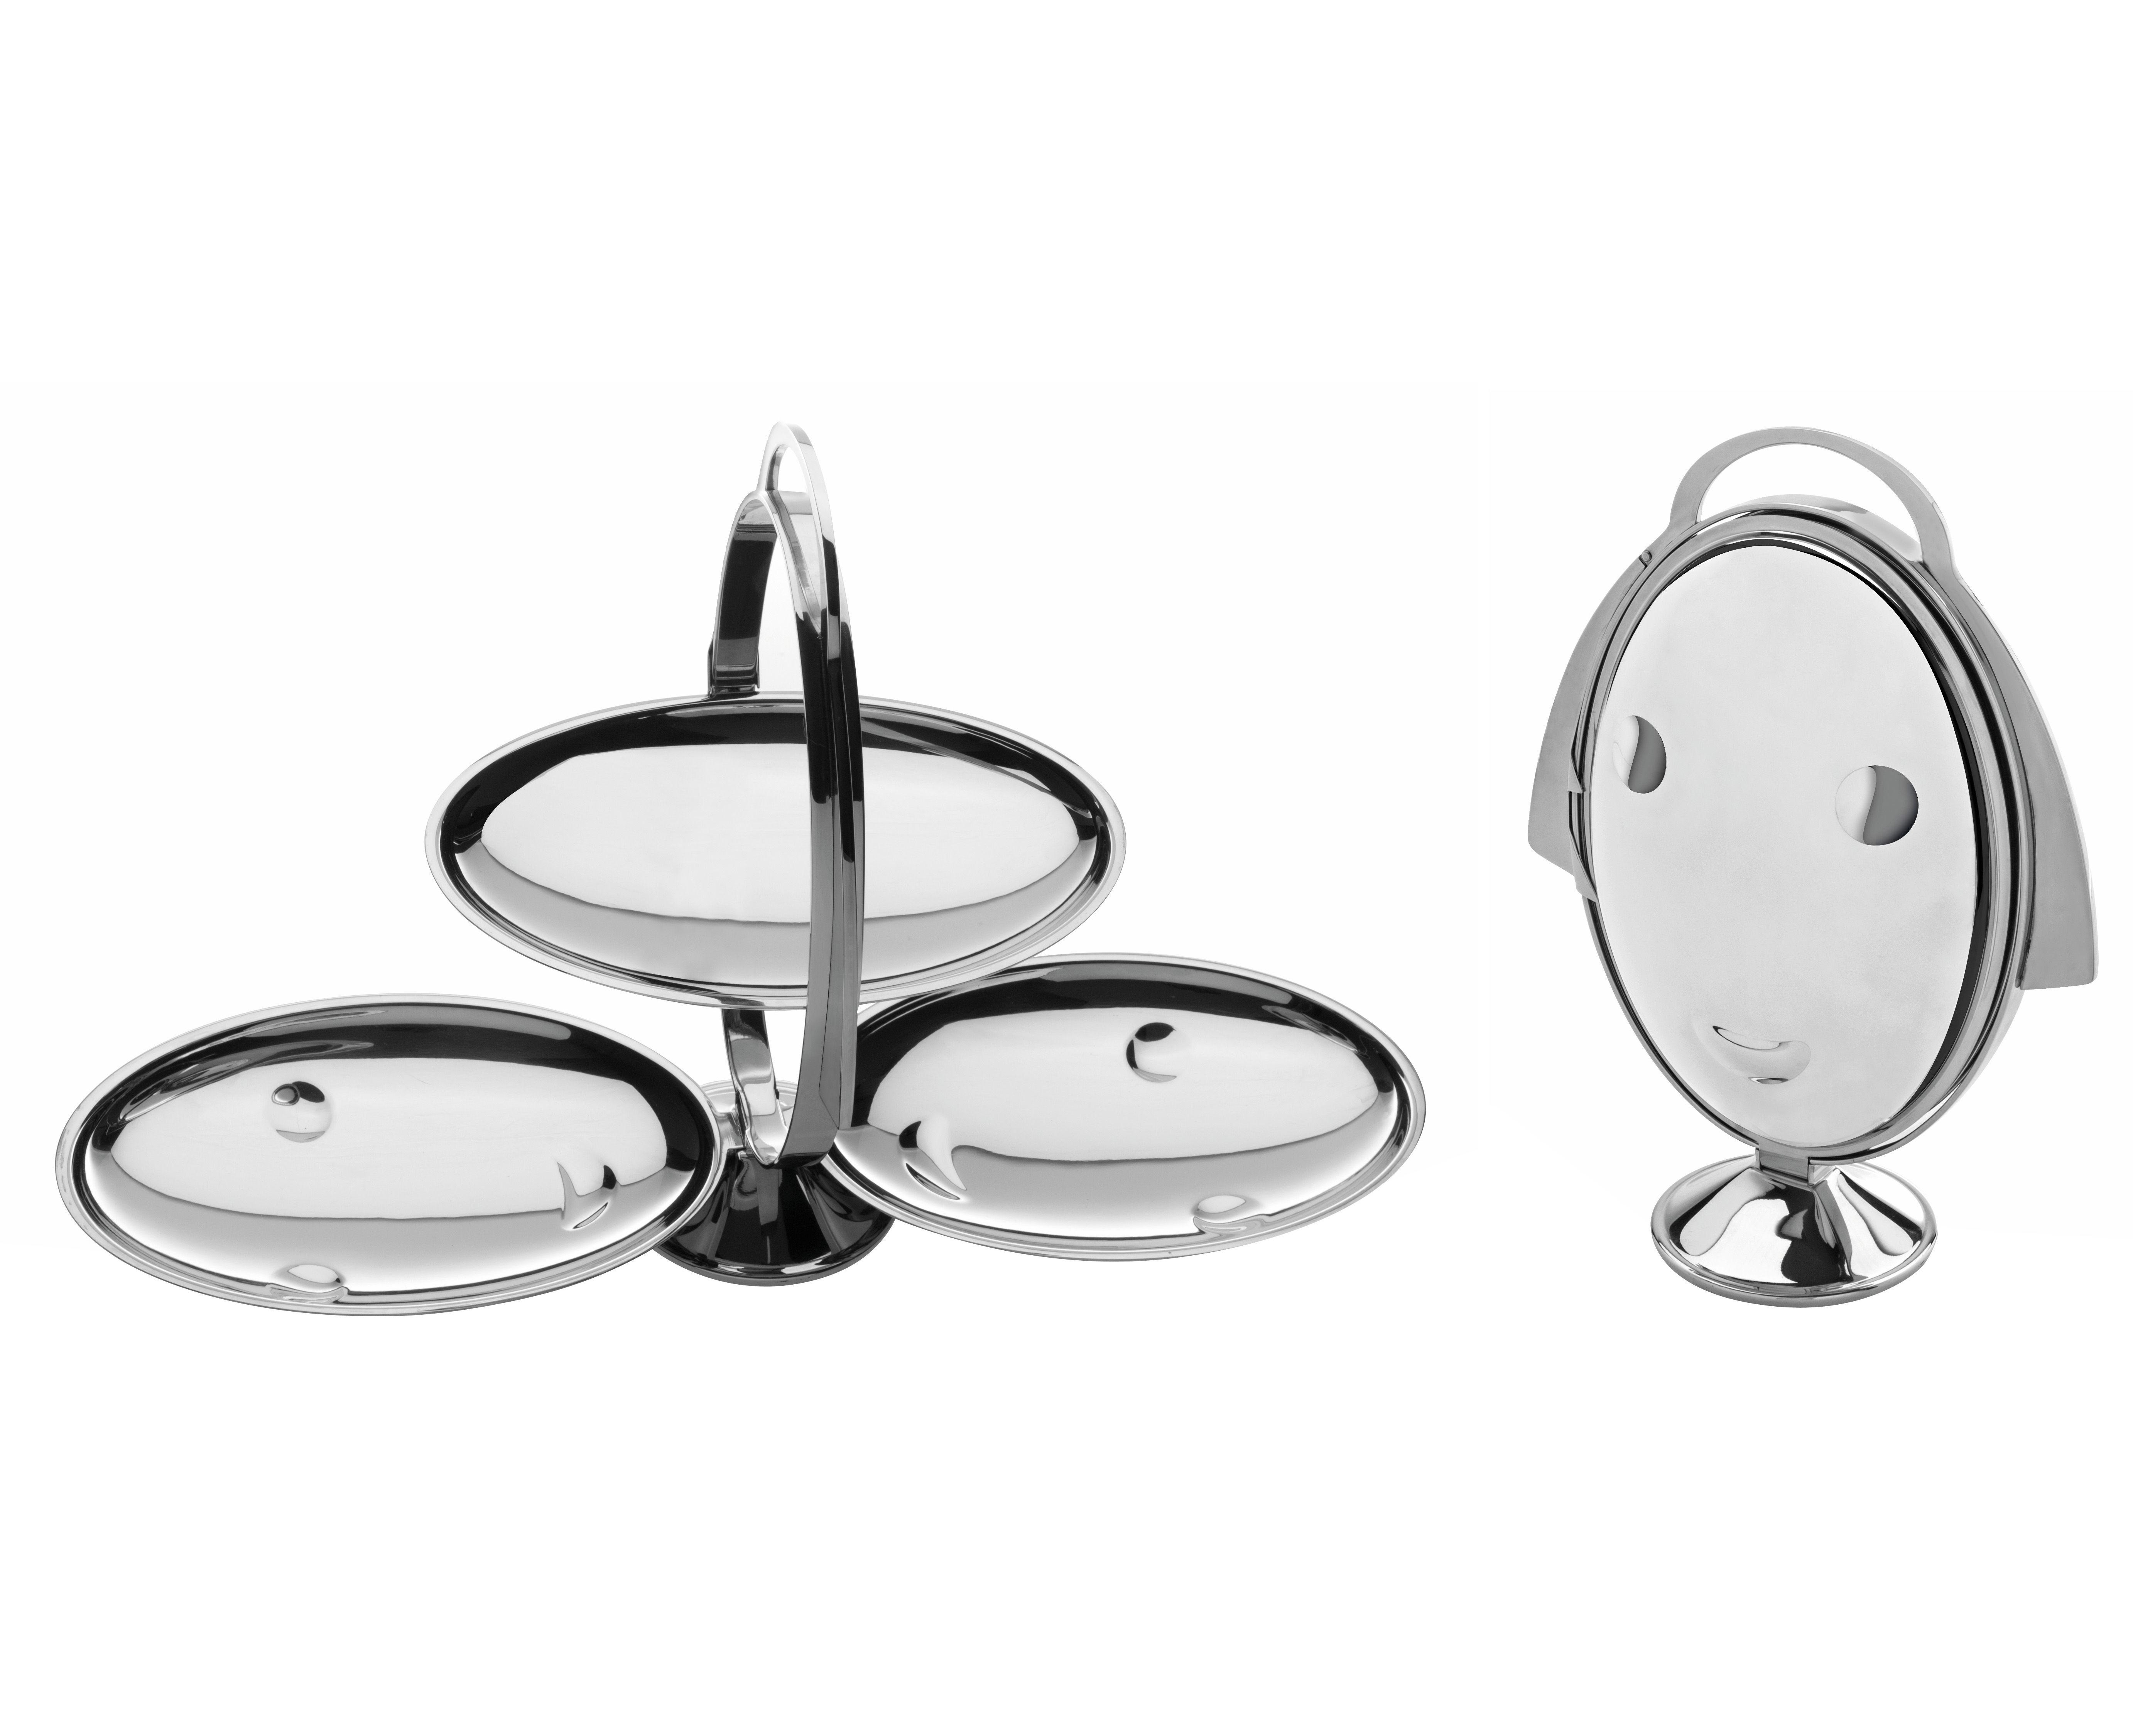 Tischkultur - Platten - Anna gong Tablett faltbare Etagère - 3 Ebenen - Alessi - Stahl glänzend - rostfreier Stahl